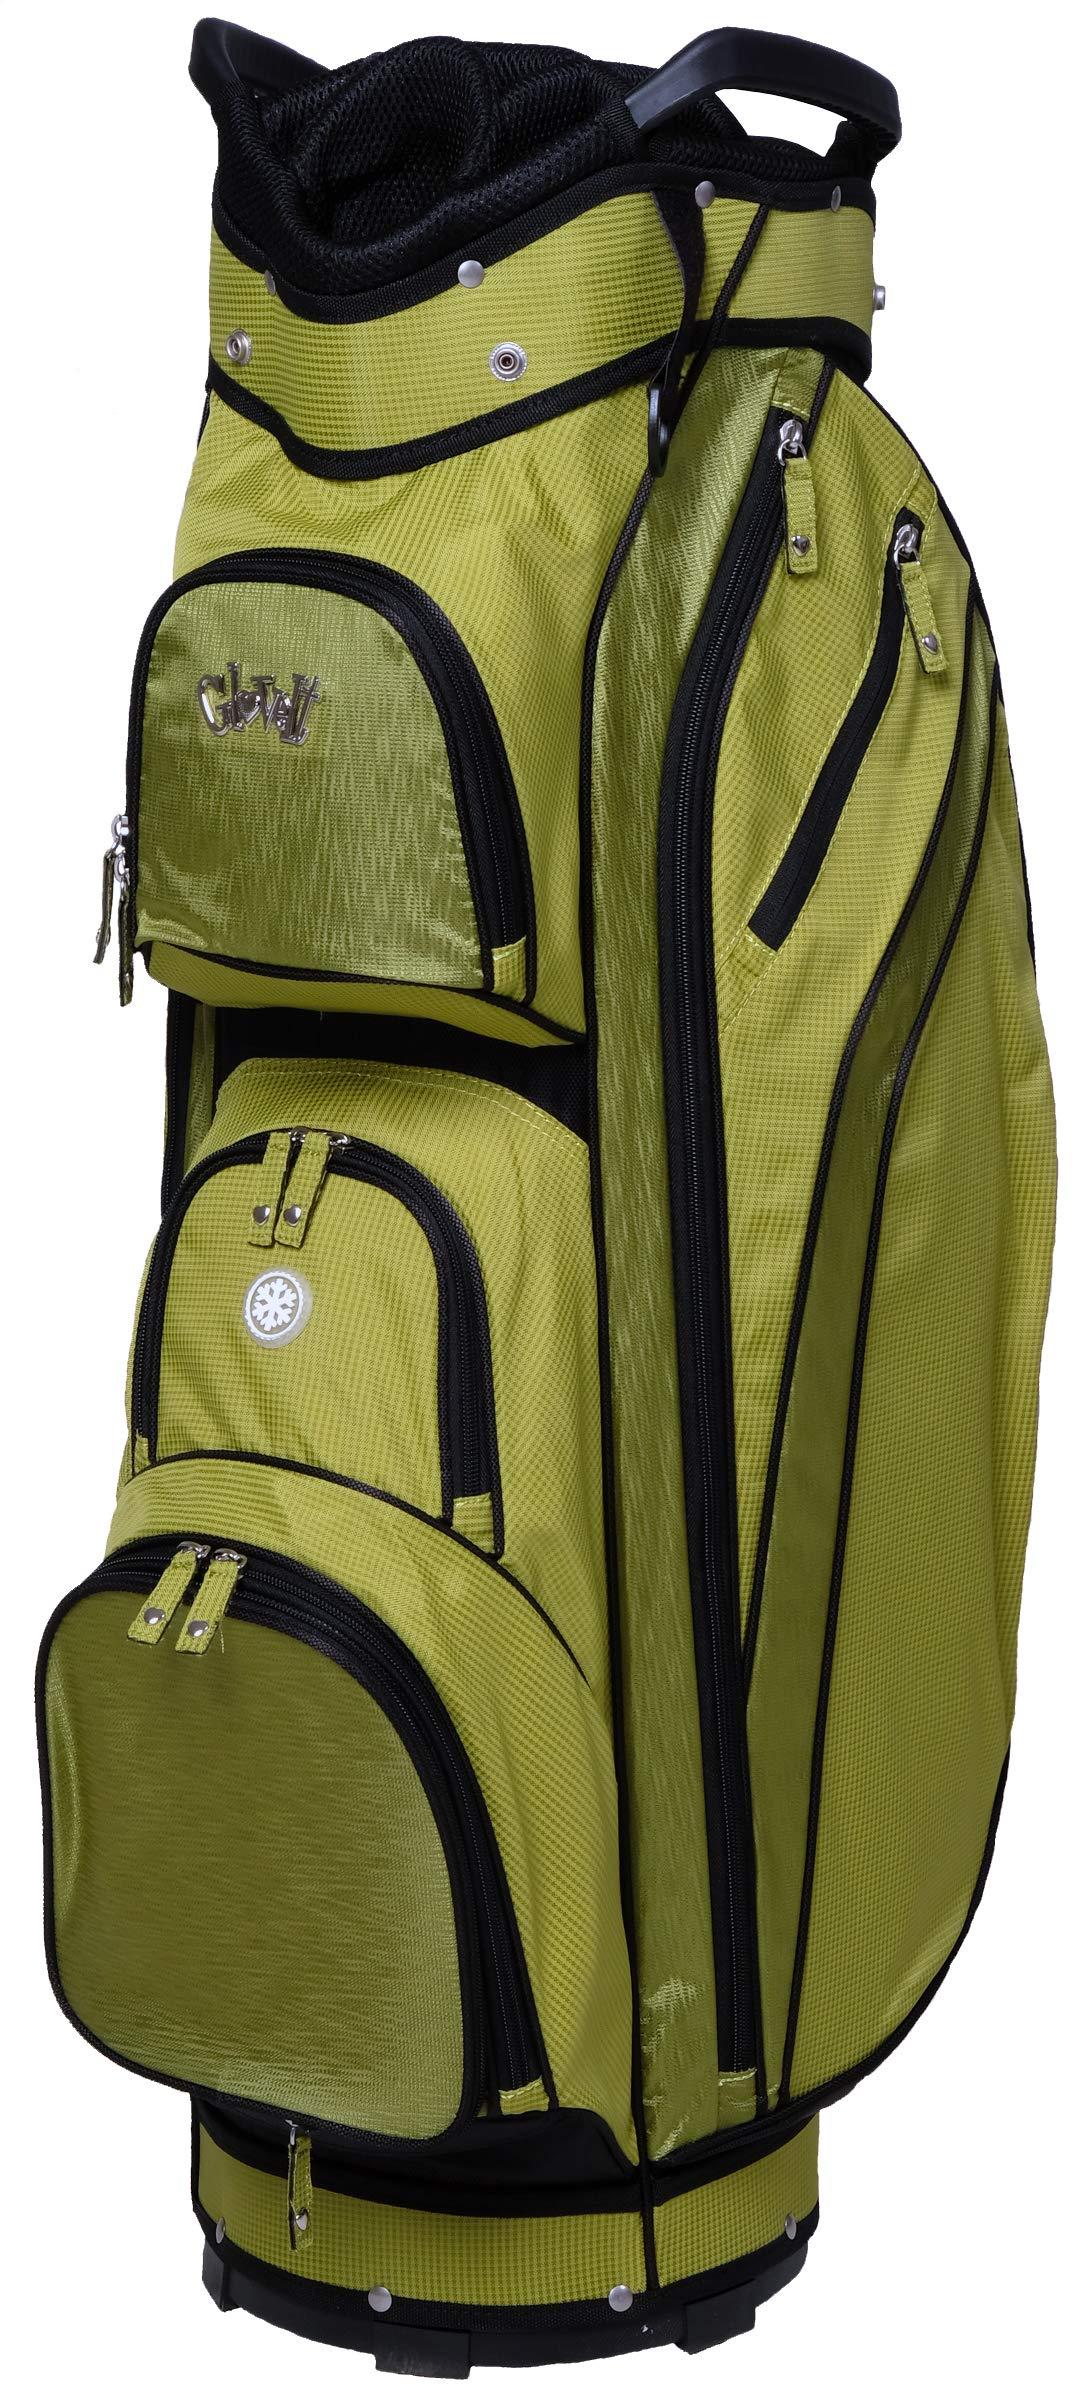 Glove It Women's Golf Bag Ladies 14 Way Golf Carry Bag - Golf Cart Bags for Women - Womens Lightweight Golf Travel Case - Easy Lift Handle - 2019 Kiwi Check by Glove It